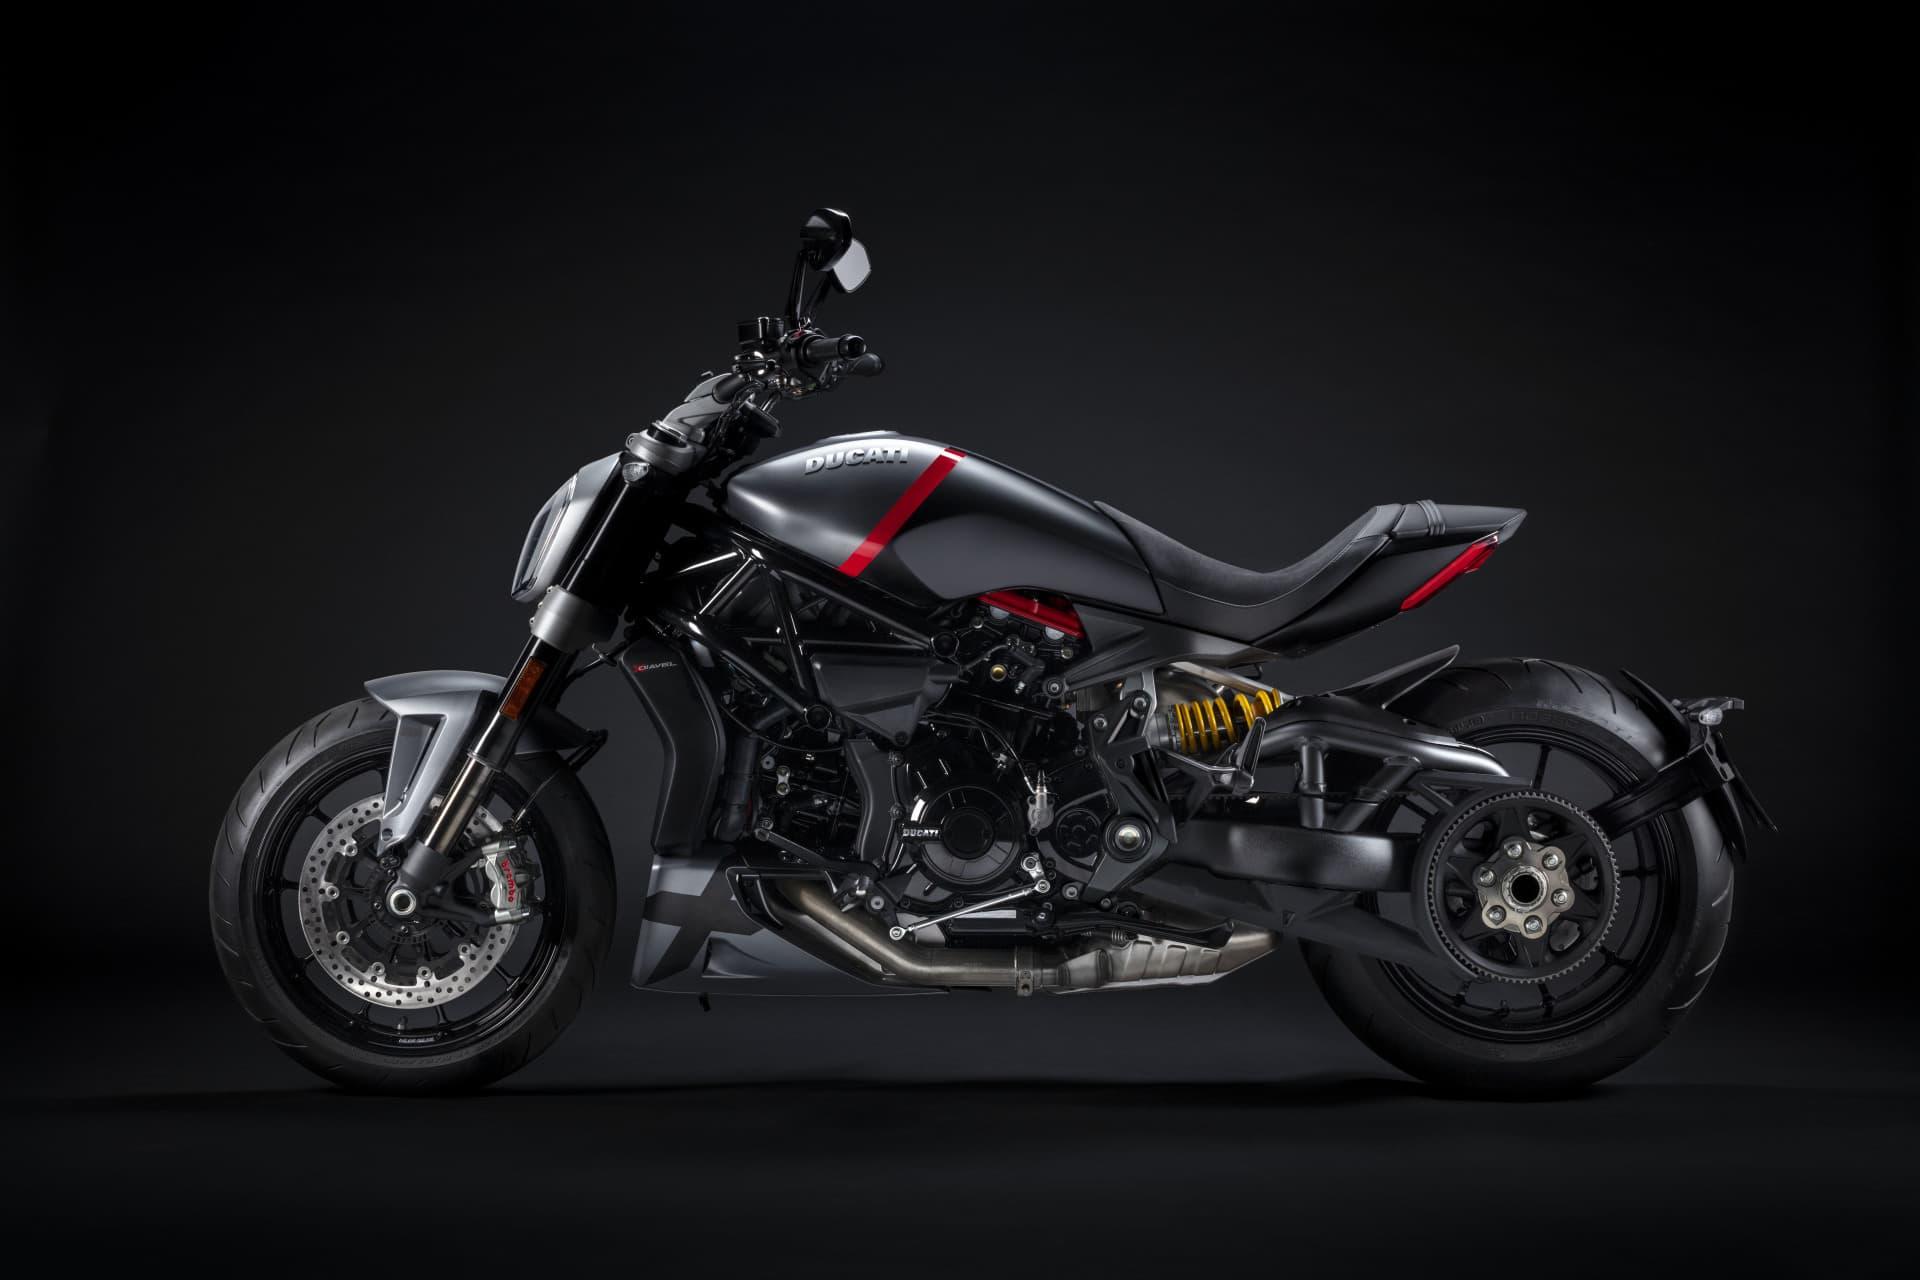 Ducati Xdiavel Black Star 2021 01